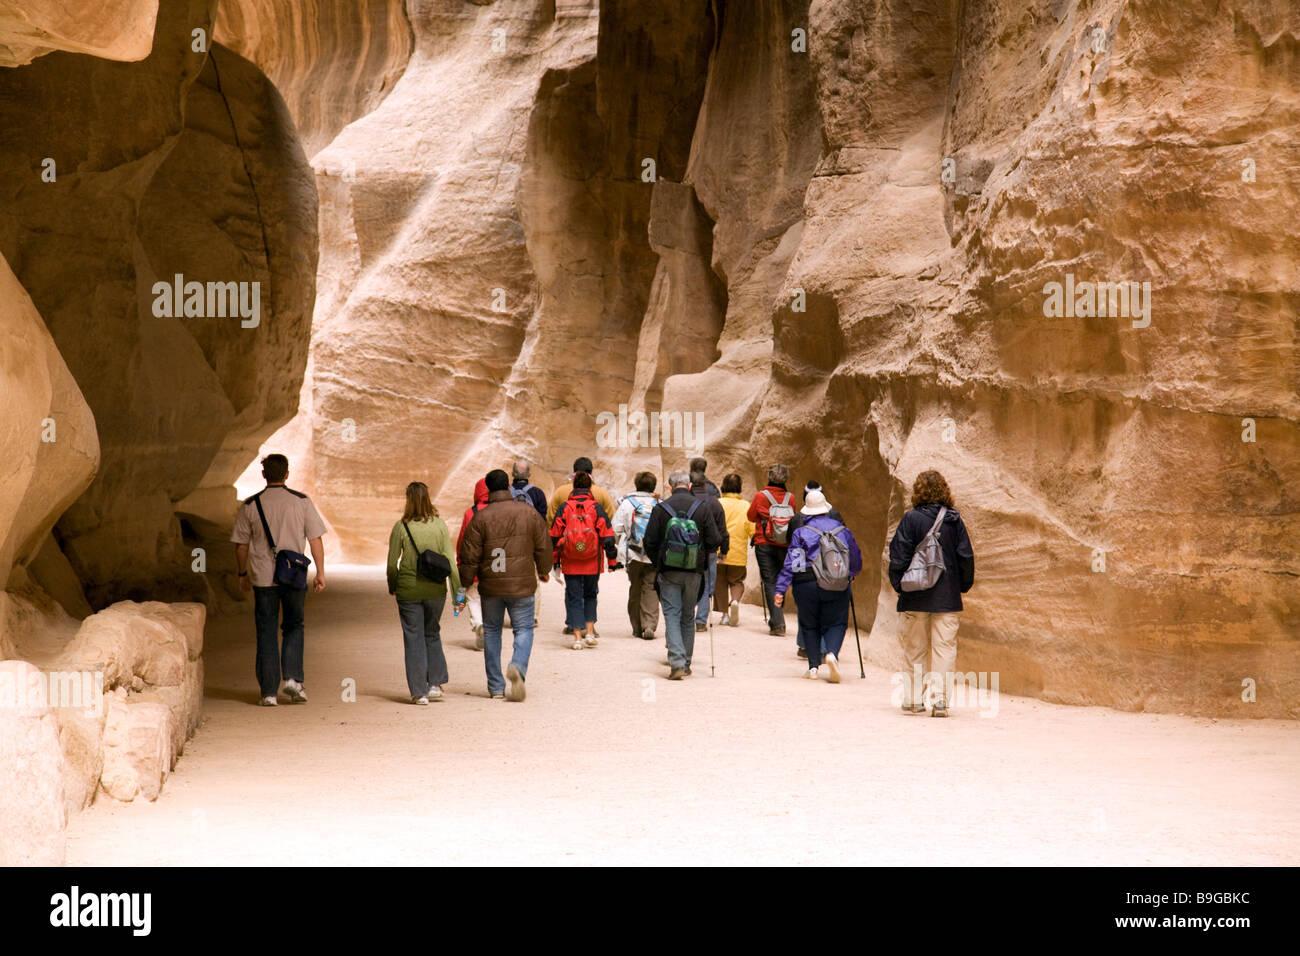 Tourists on a guided tour walk through the Siq on their way to Petra, Jordan - Stock Image